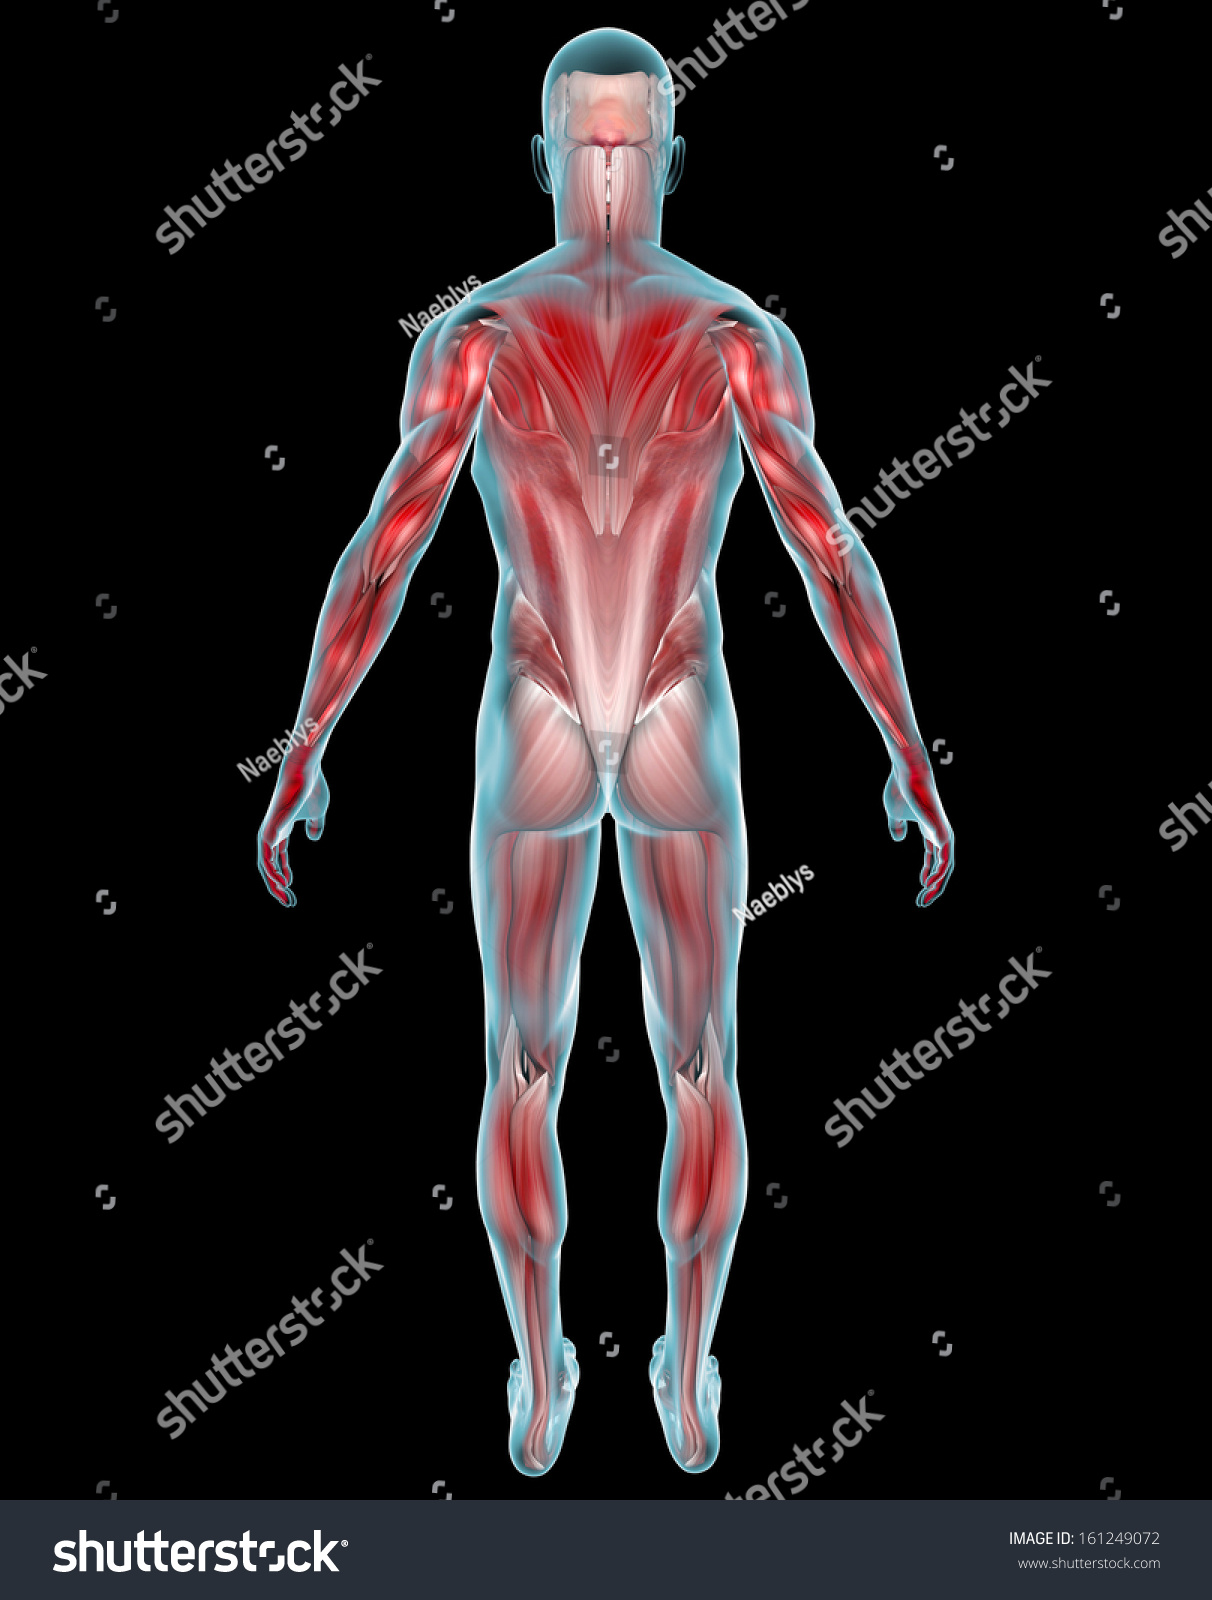 Man Muscles Human Body Xray Back Stock Illustration 161249072 ...